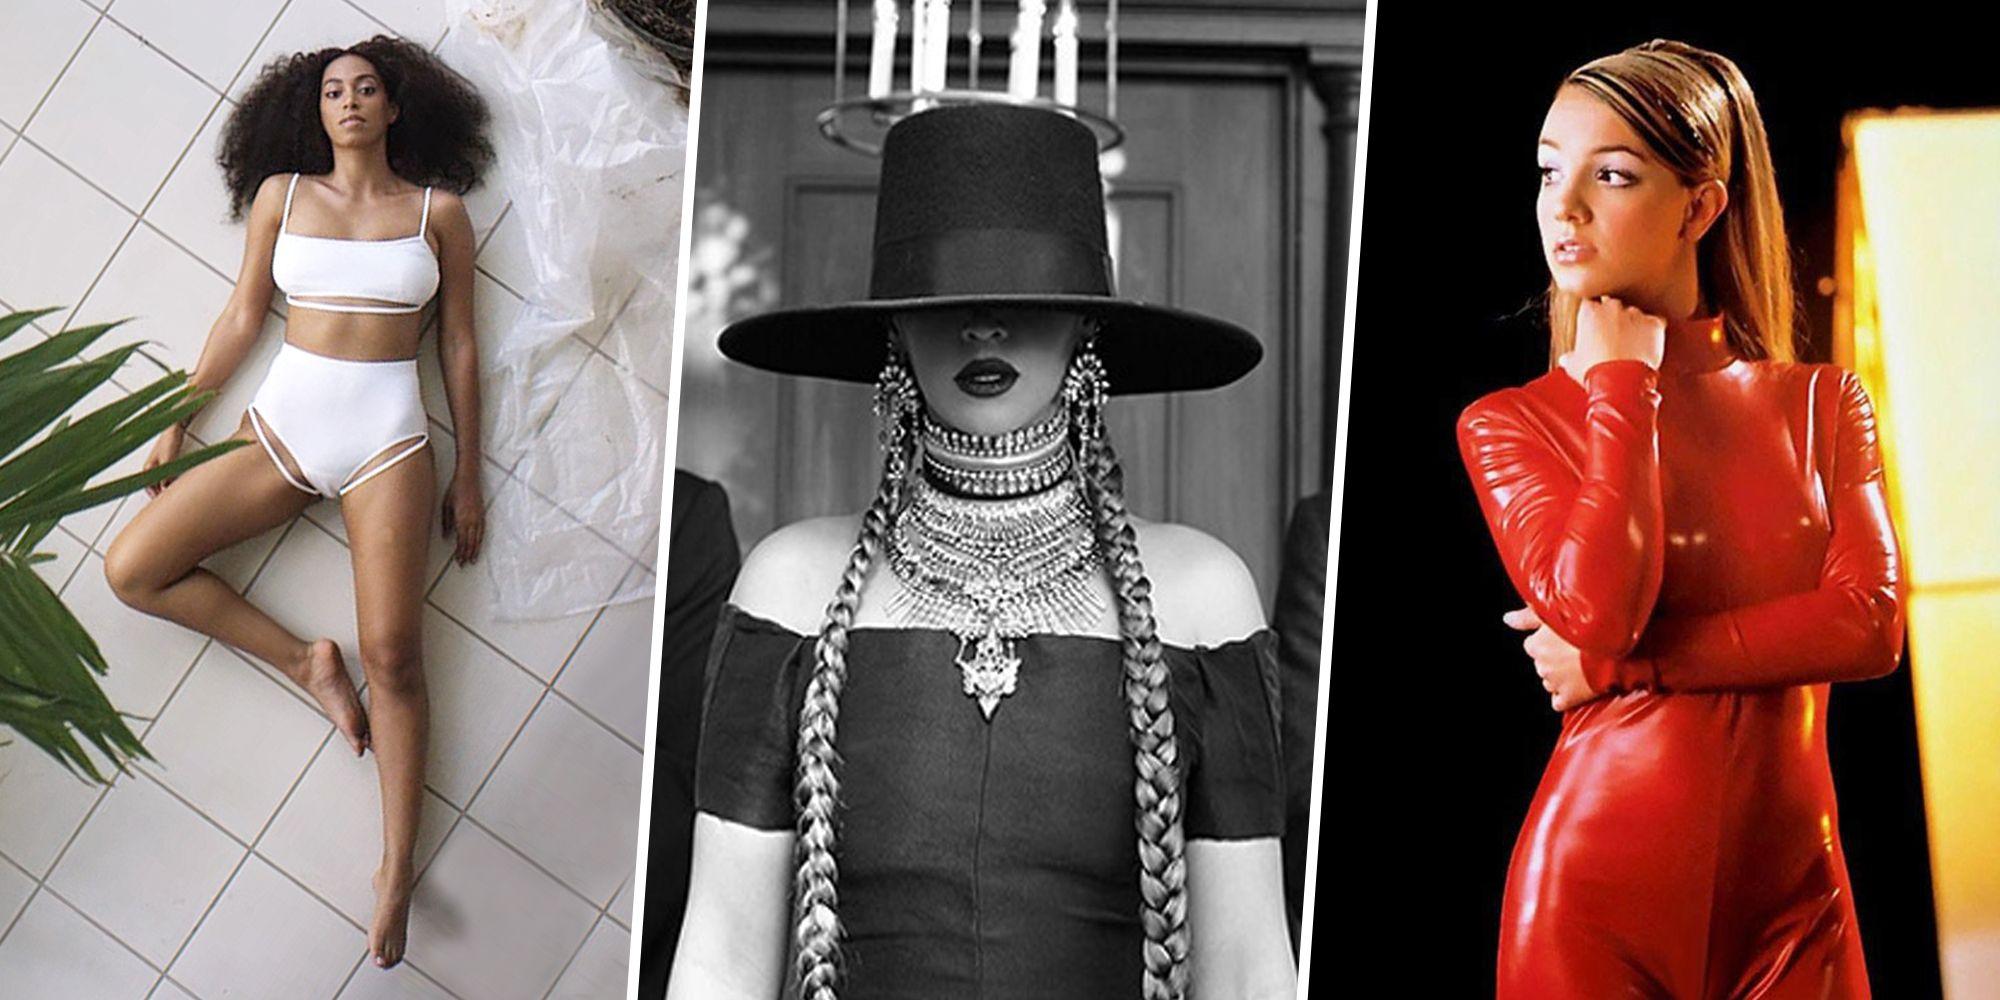 Top Models In Music VideoHistory